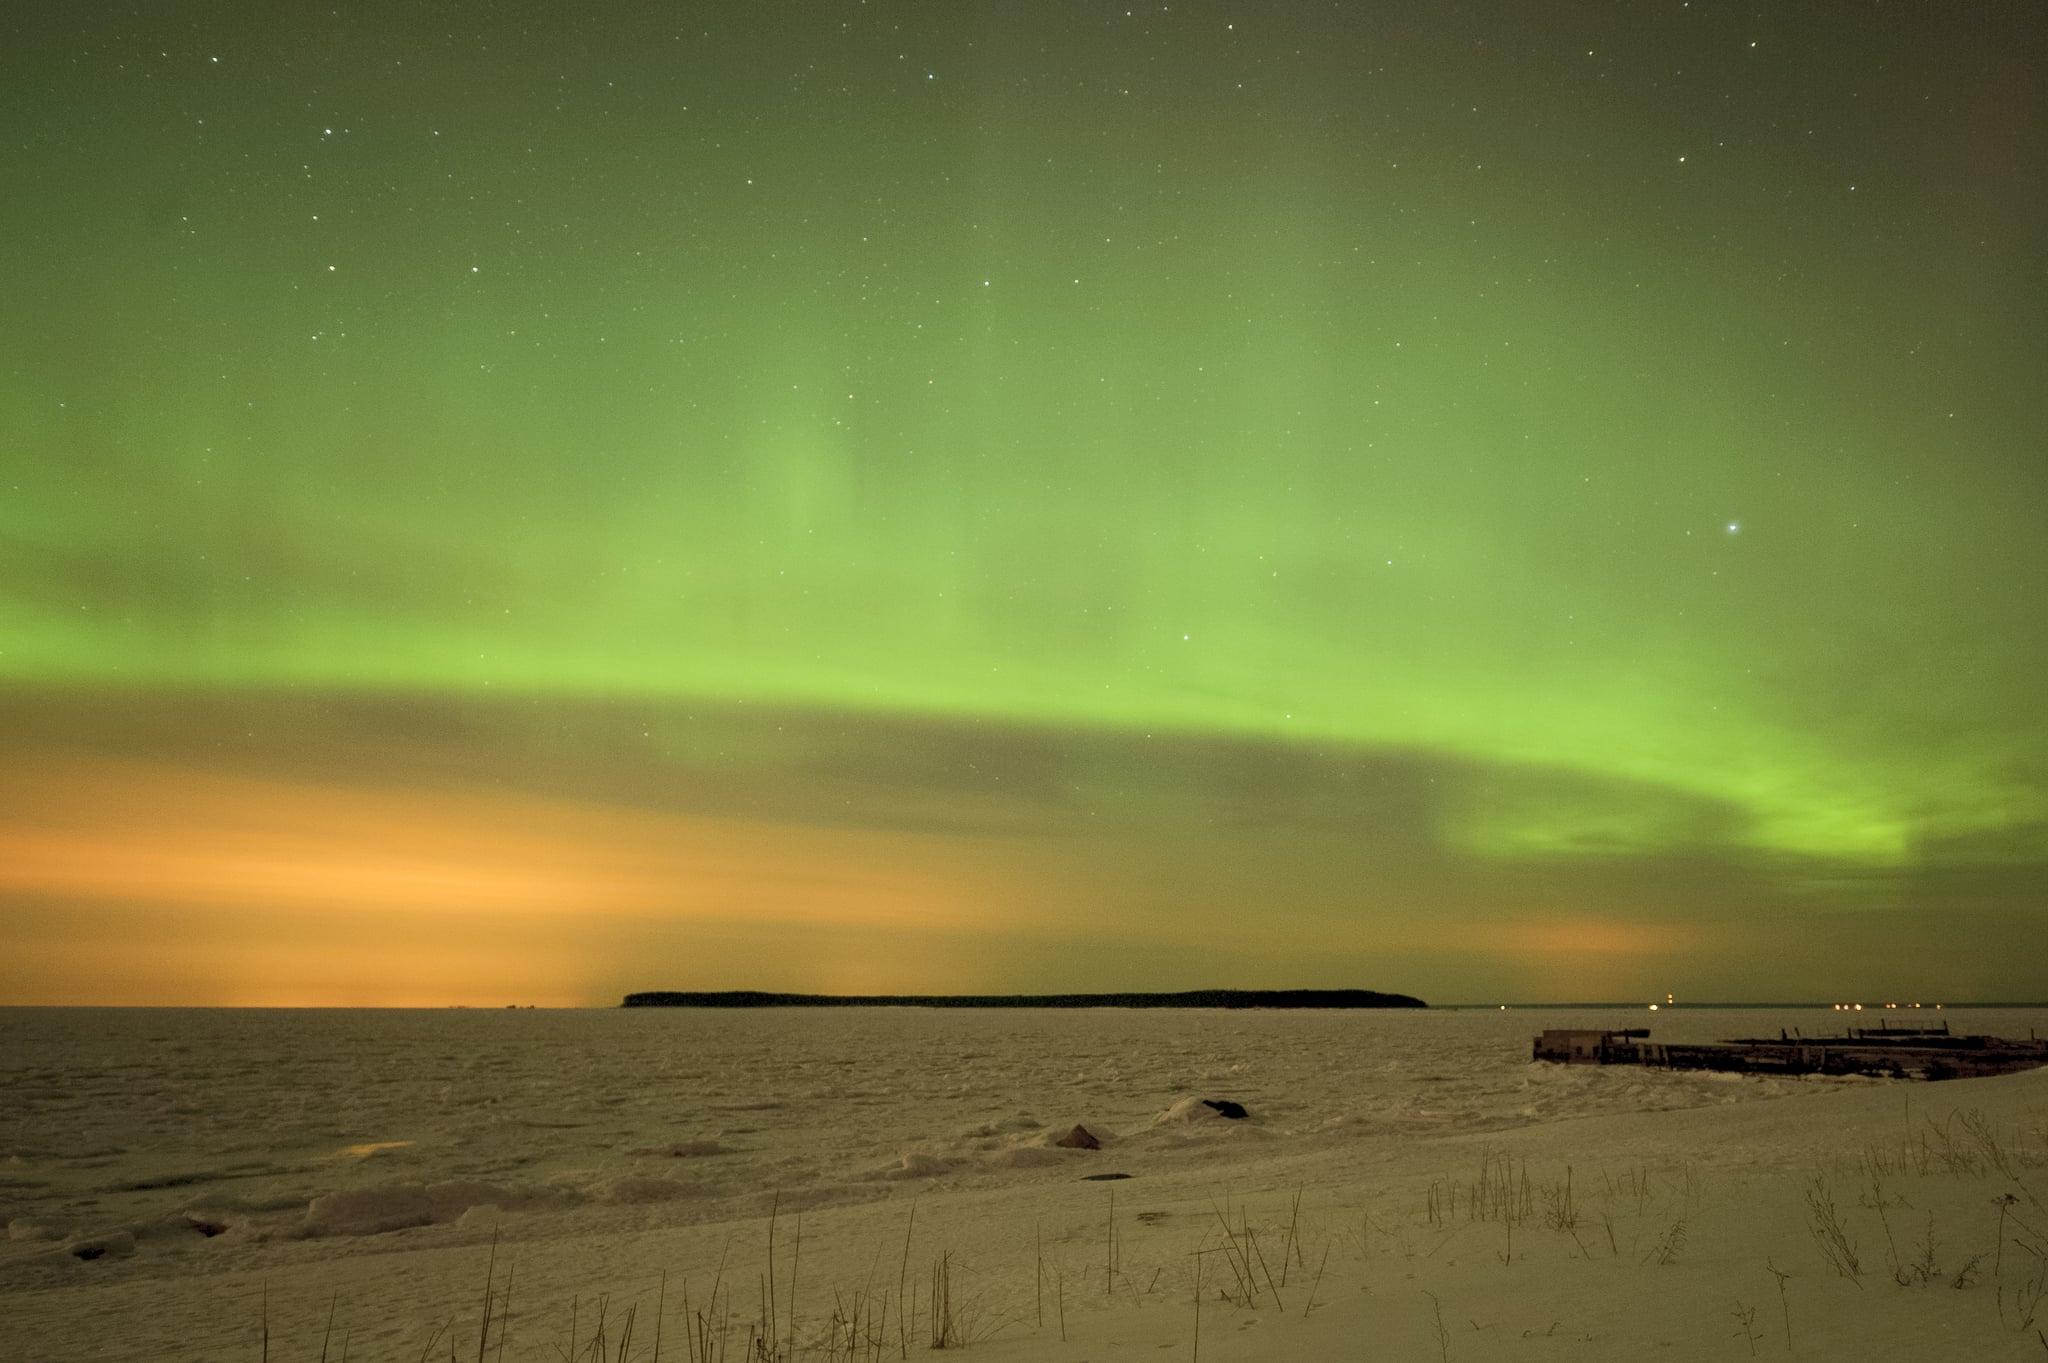 The aurora borealis was seen from Tallinn, Estonia, in March 2013.